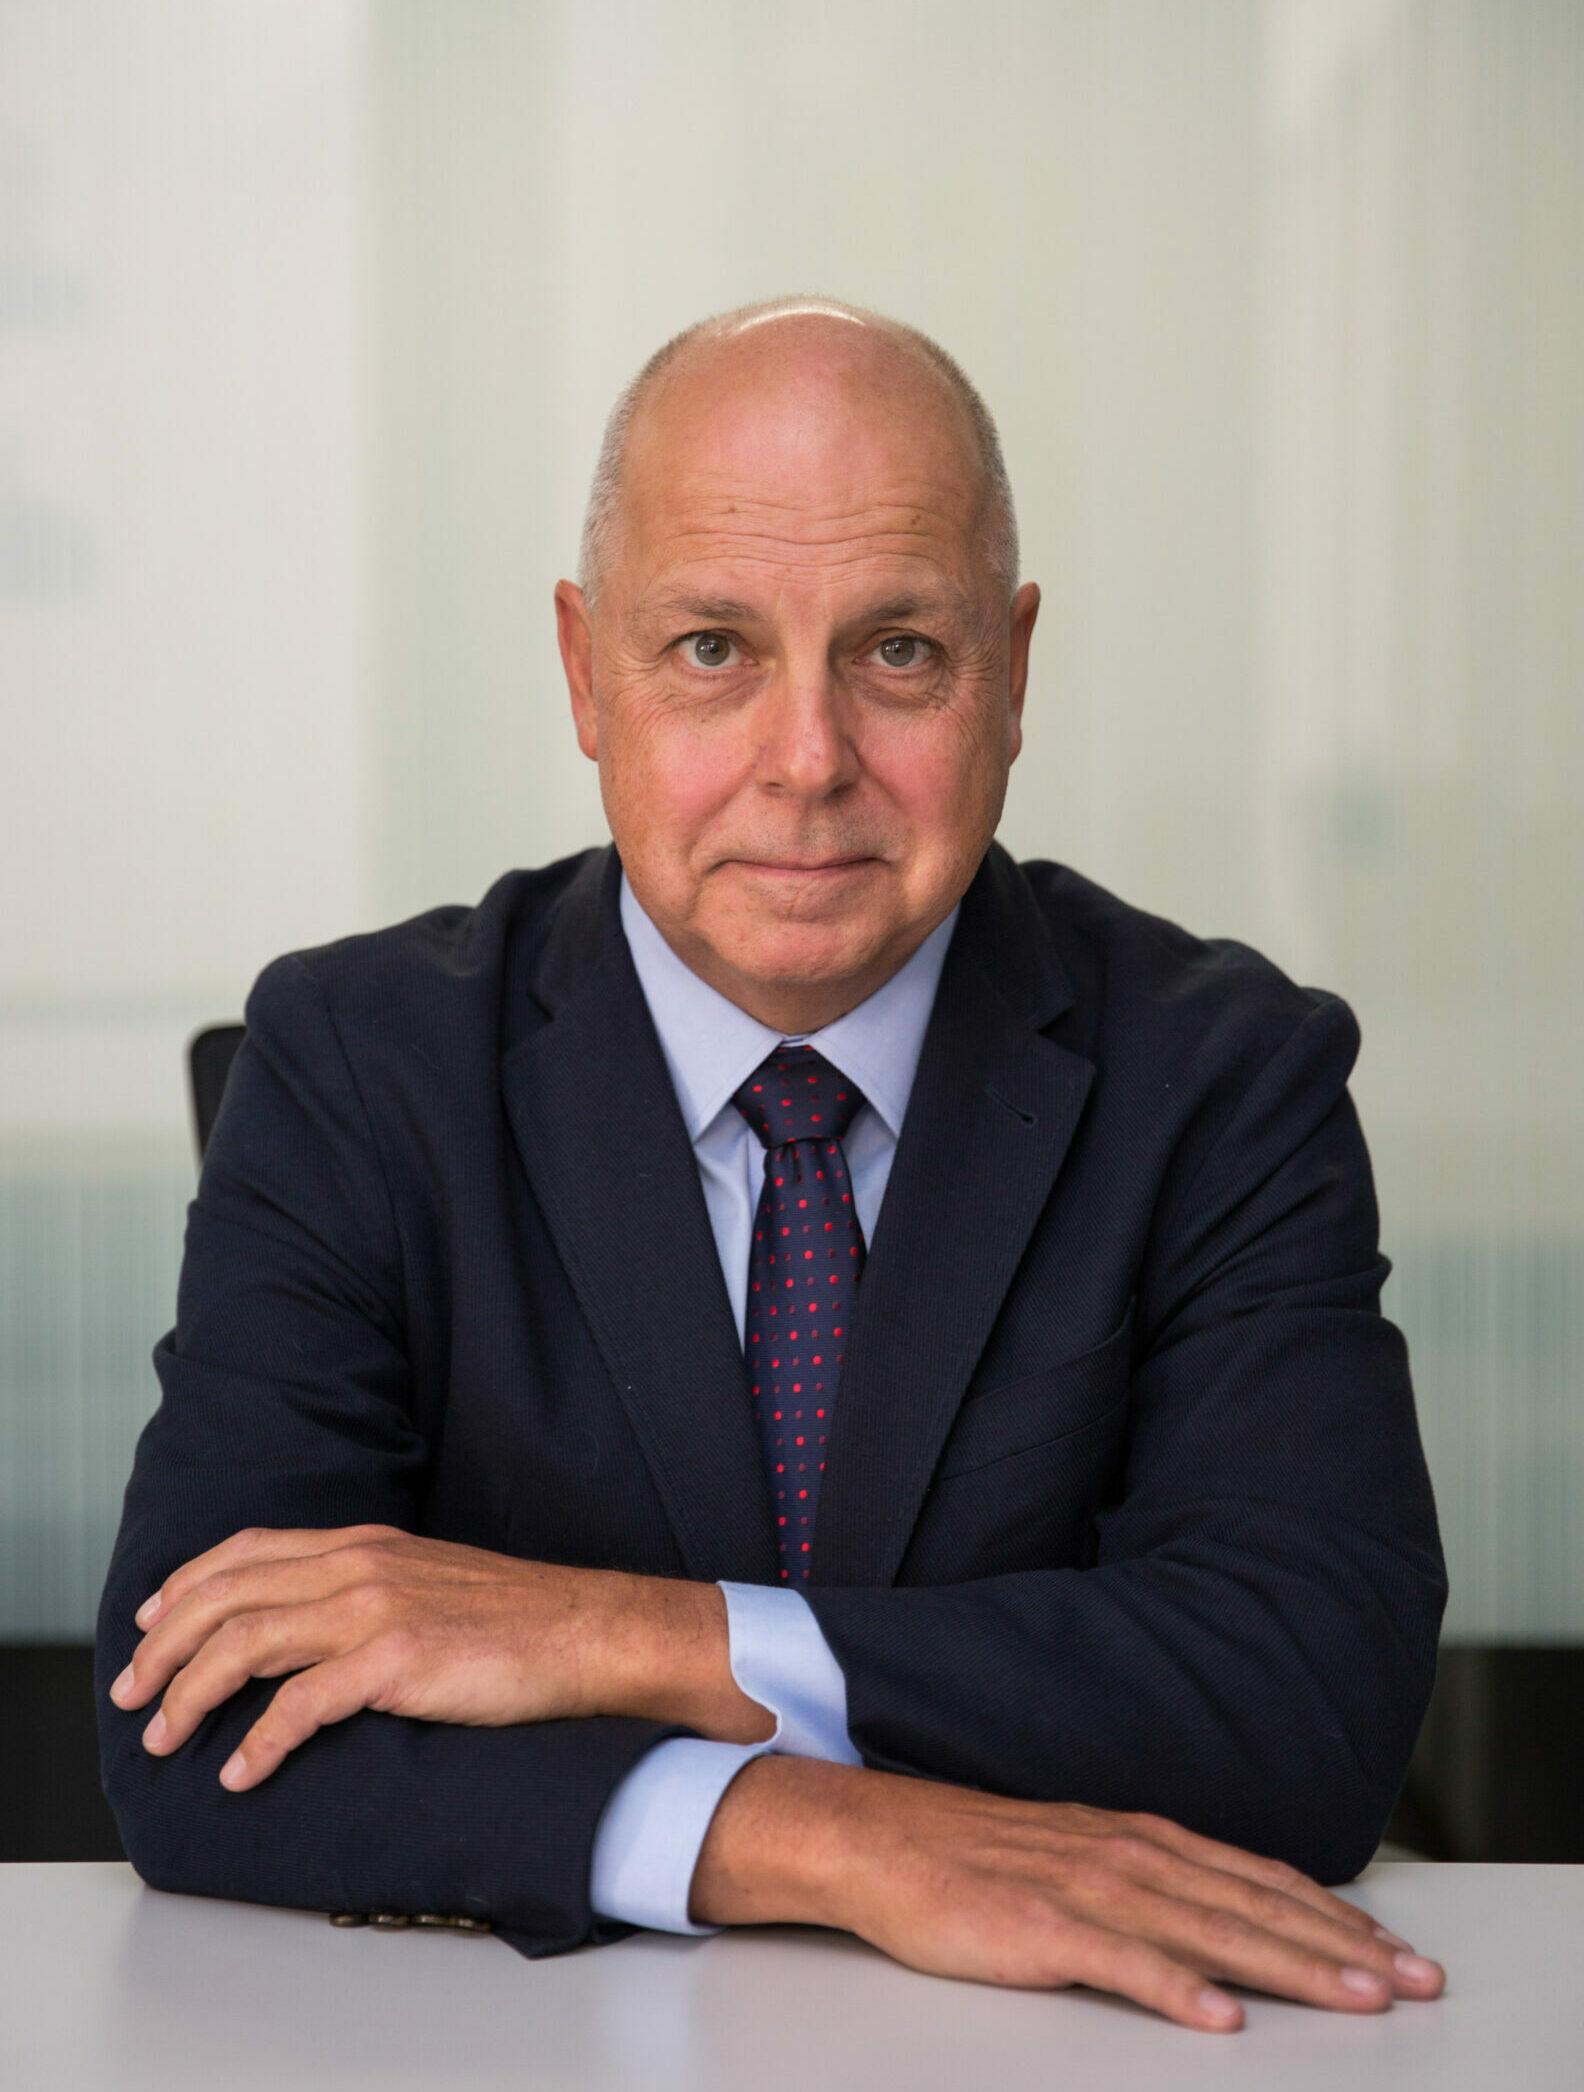 Tim Pallas MP